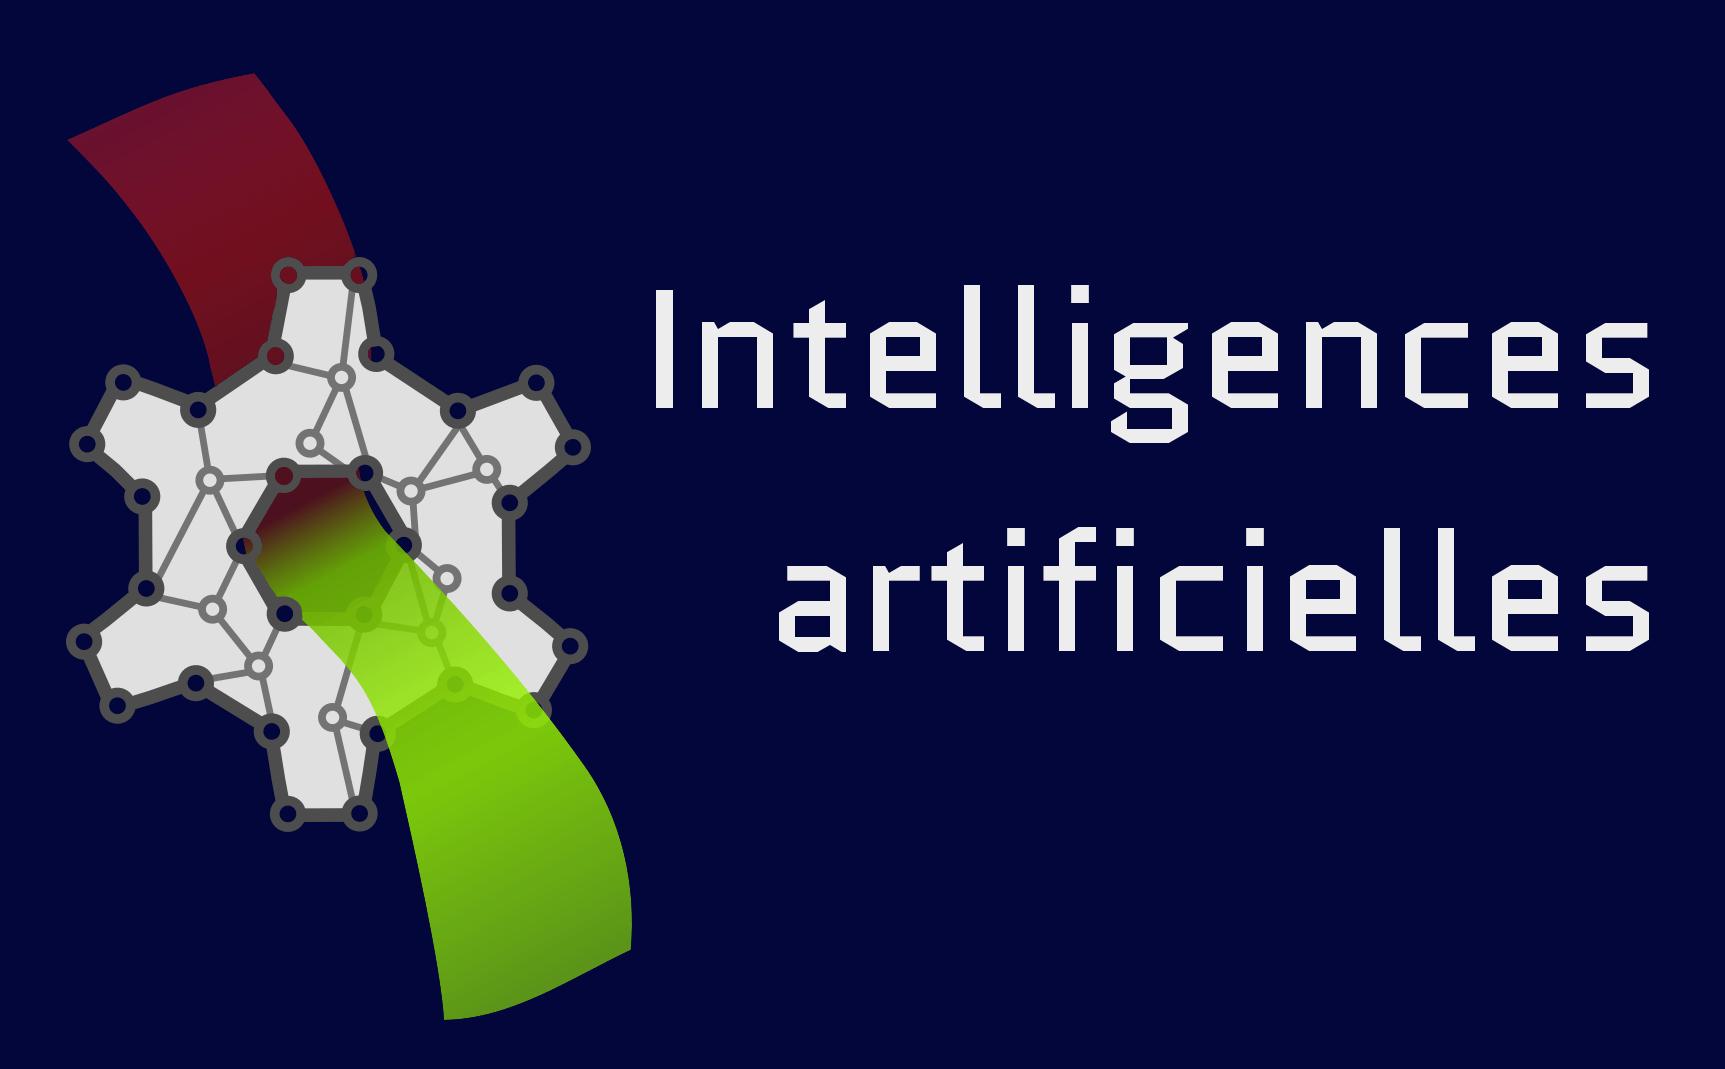 Intelligences artificielles